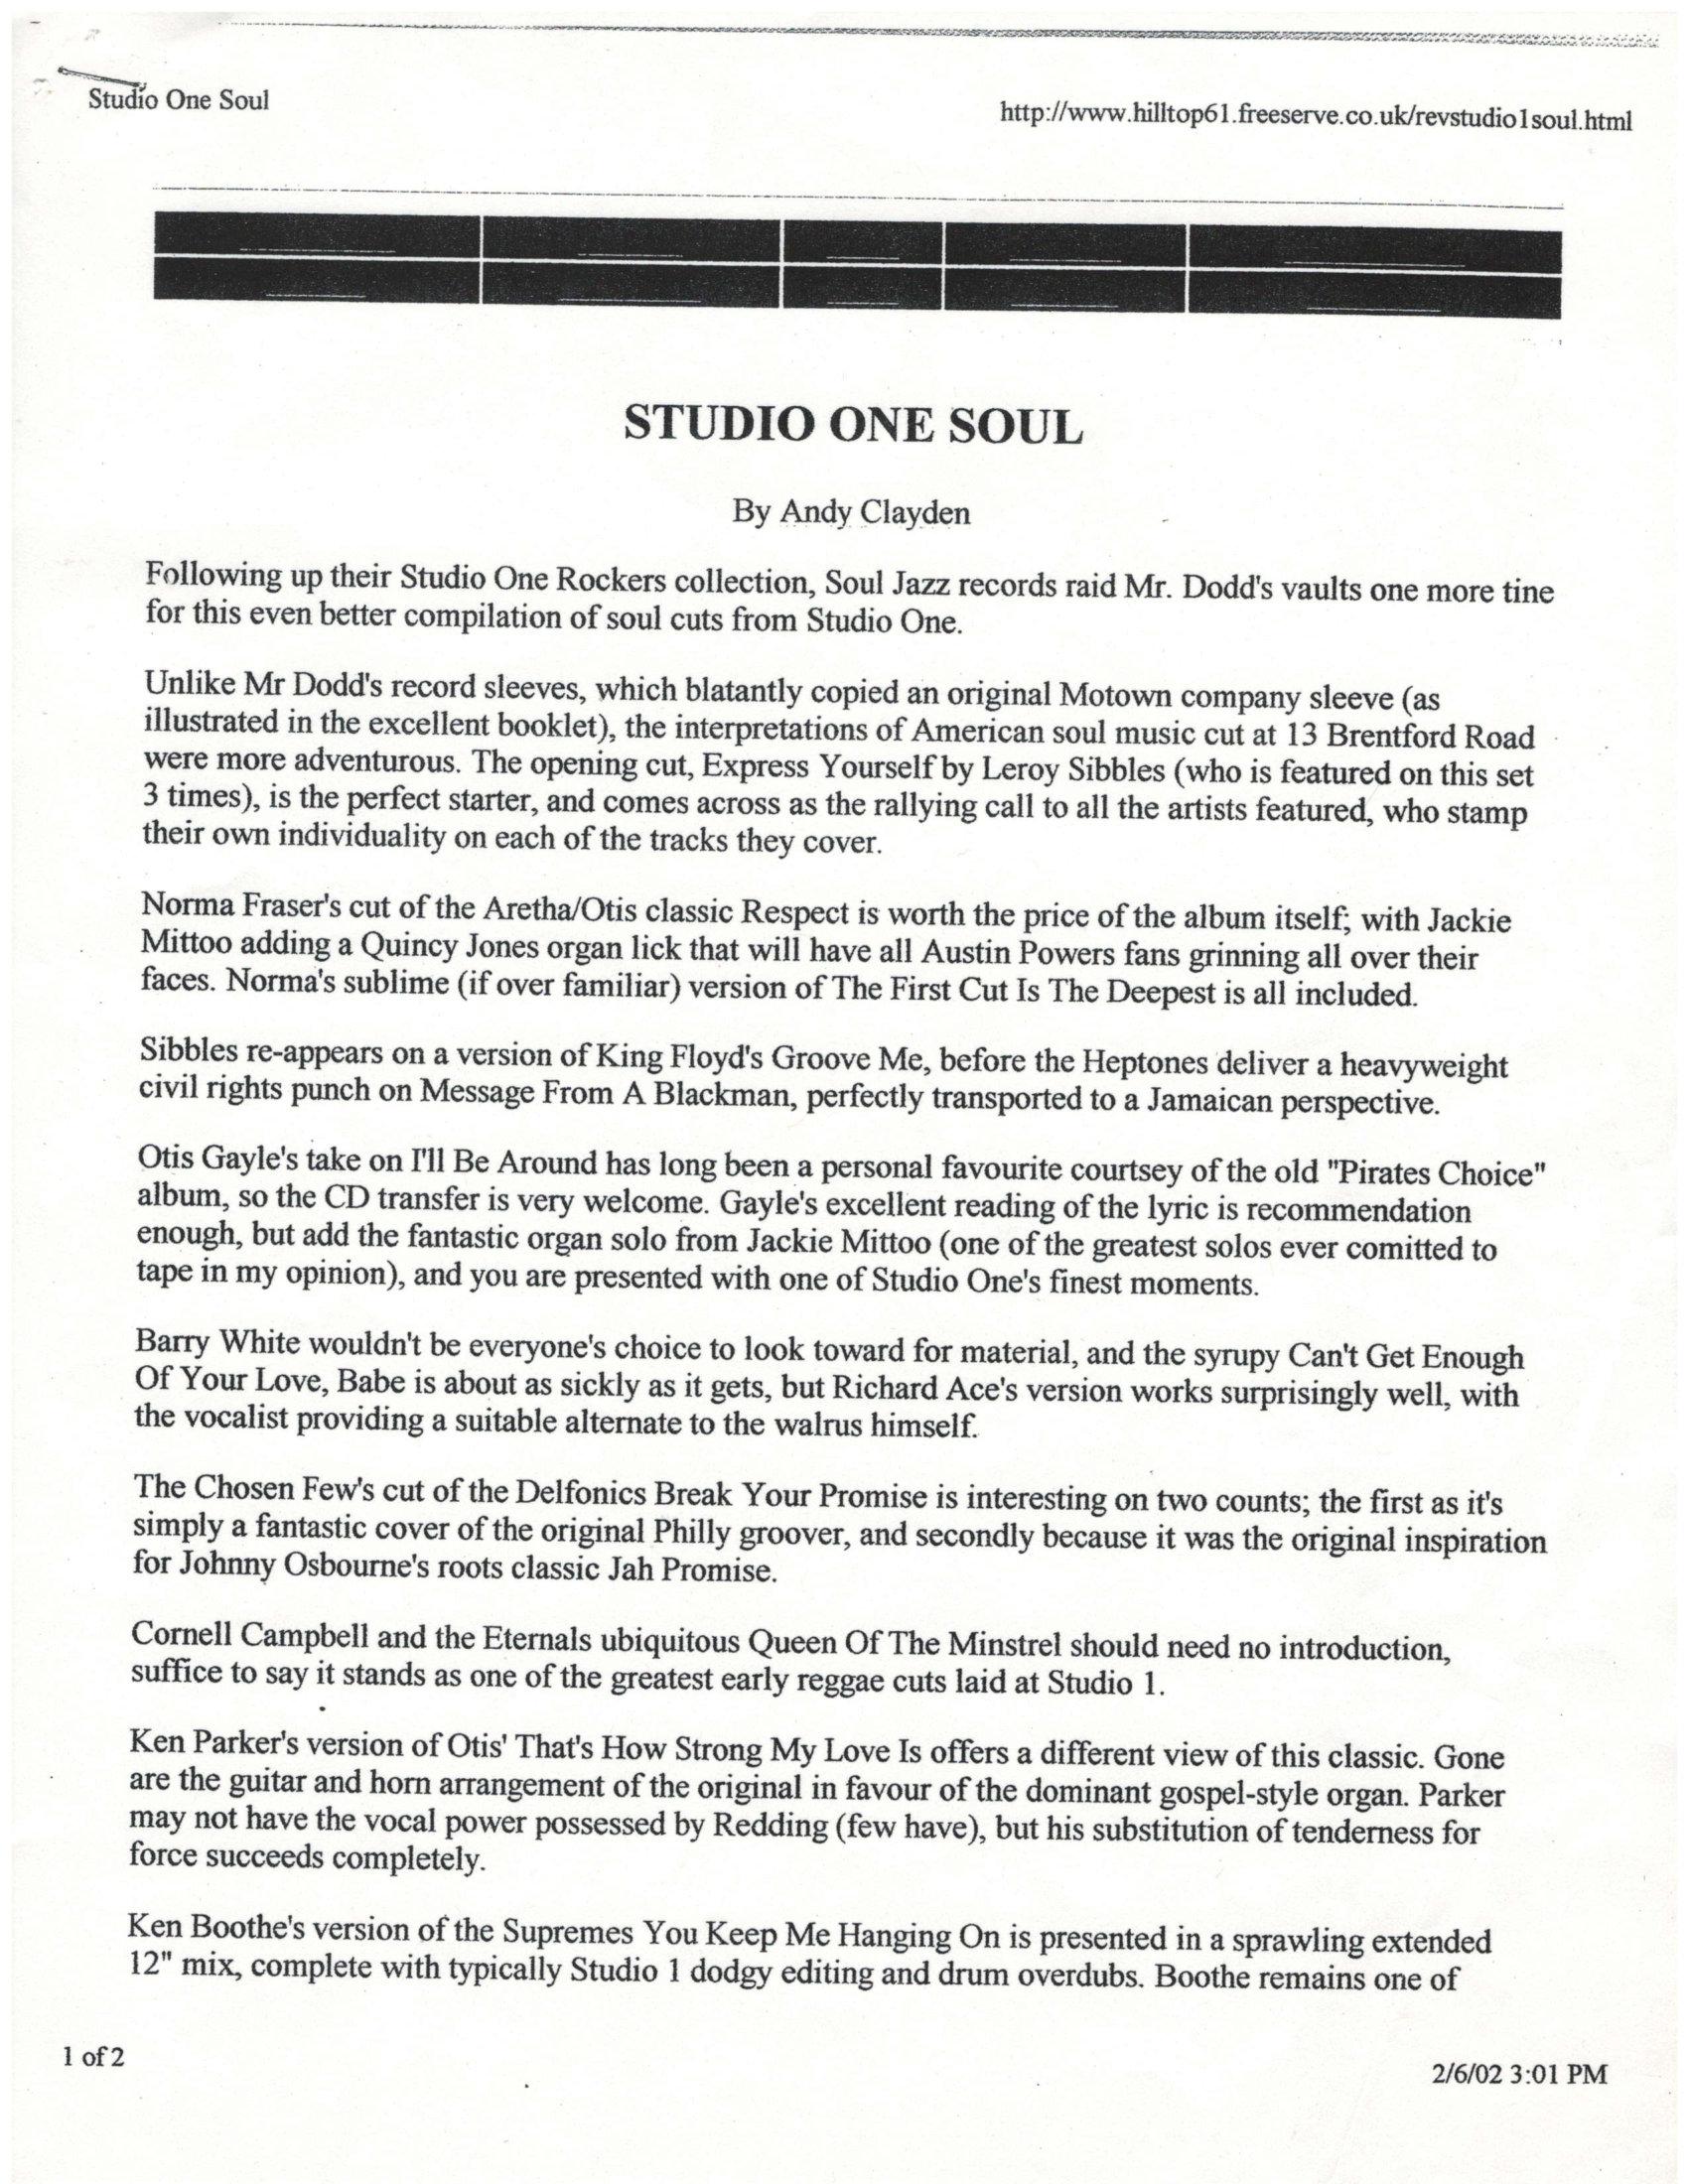 Studio One Soul Album Review-1